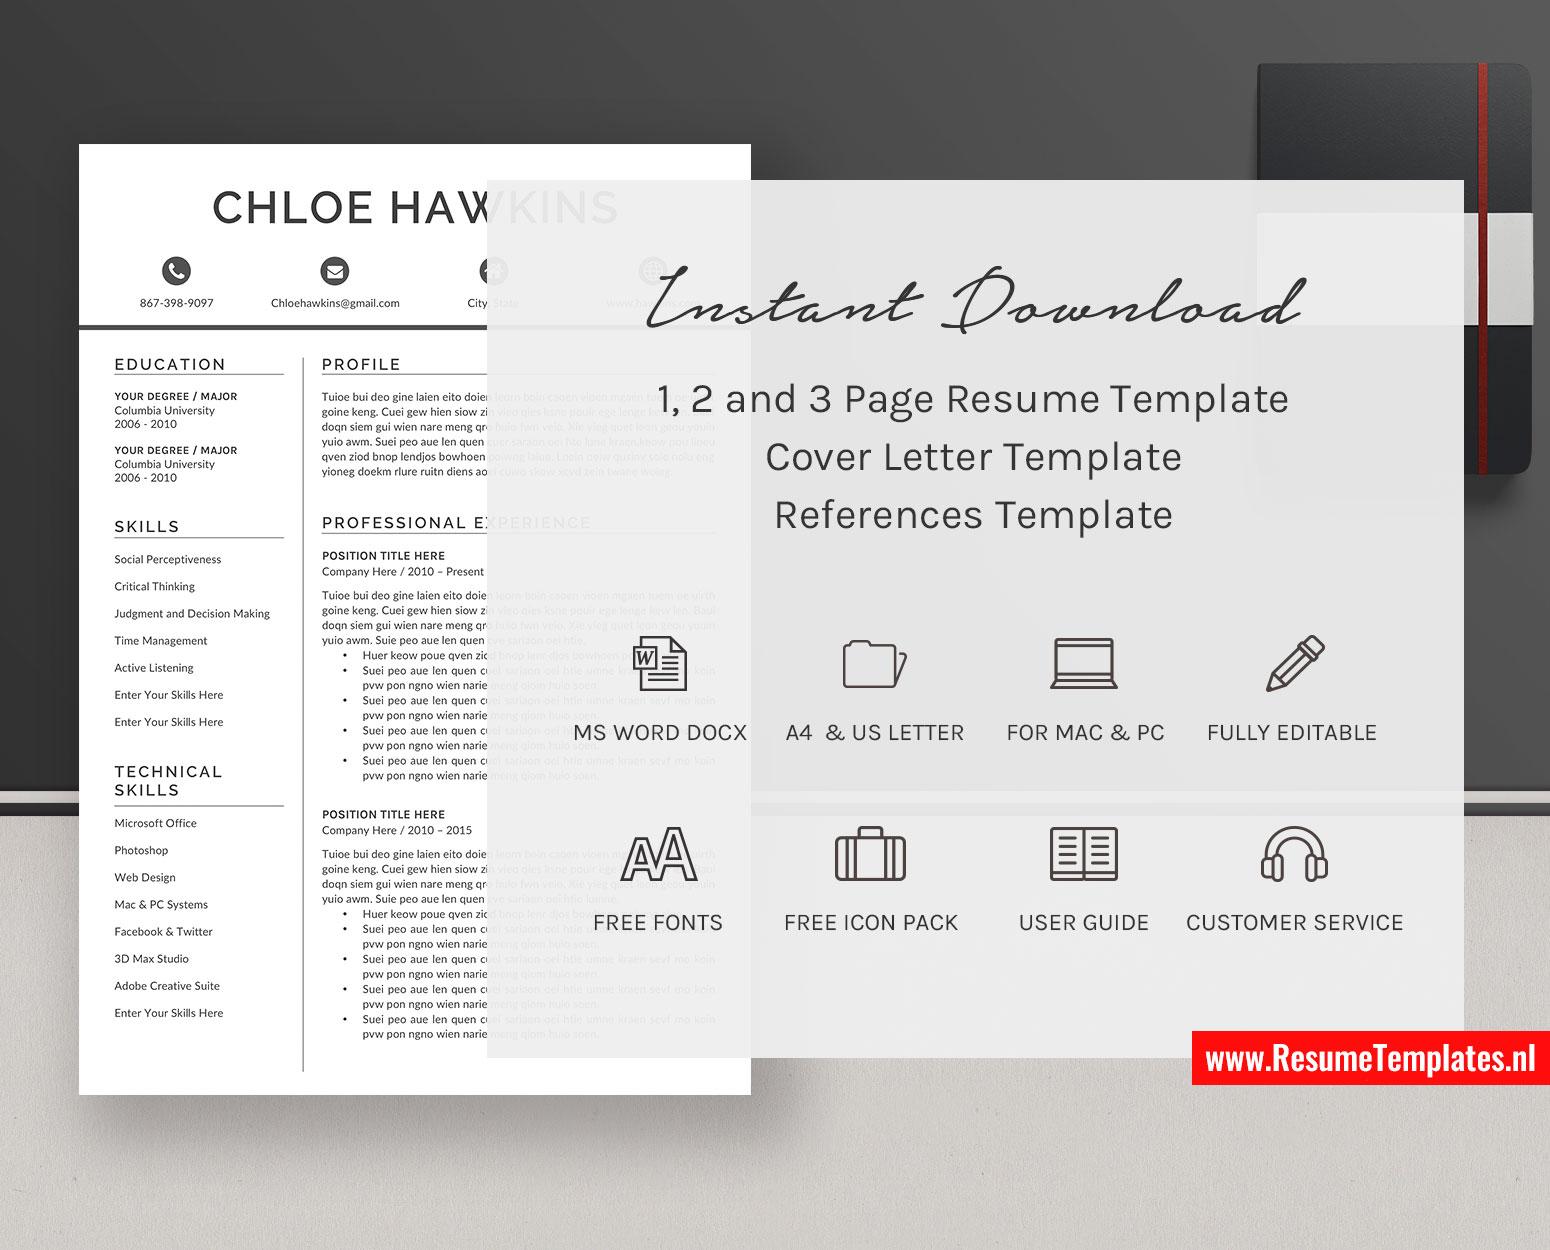 Professional Curriculum Vitae Format from www.resumetemplates.nl